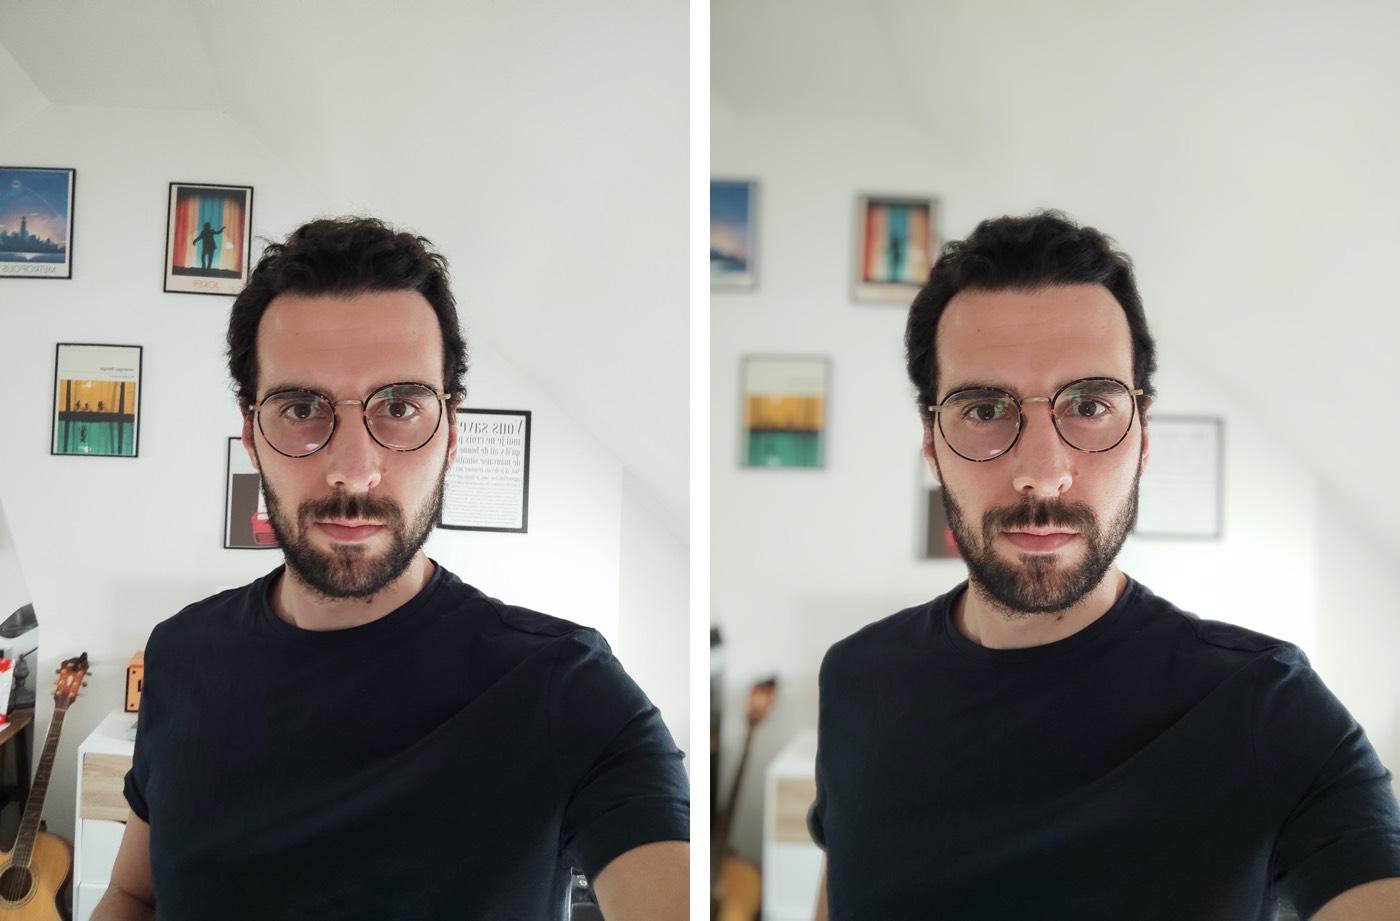 test xiaomi mi 10 selfies - Xiaomi Mi 10 review: a new bitter-tasting recipe - lemon squeezer